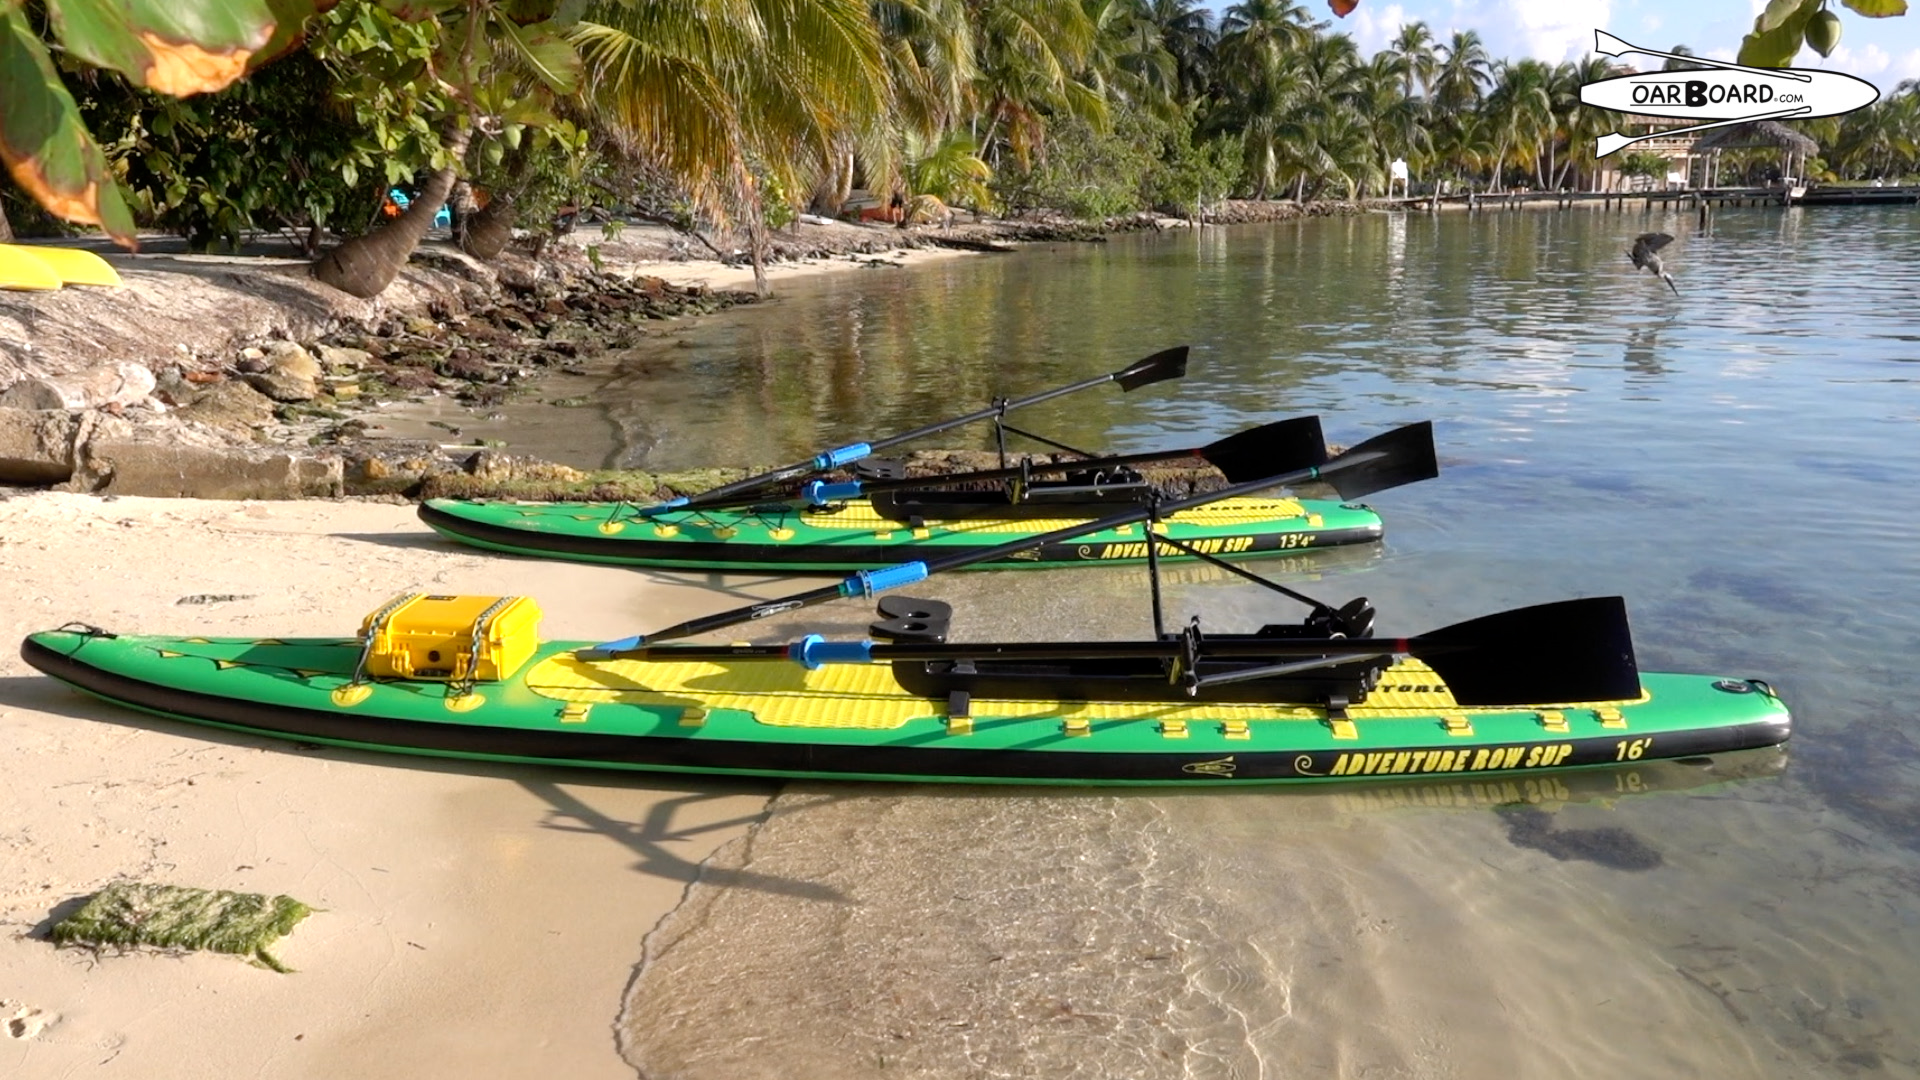 Oar-Board-Rower-Belieze-Travel-Rowing-Adventure-SUP-Stand-up-Paddle-Board